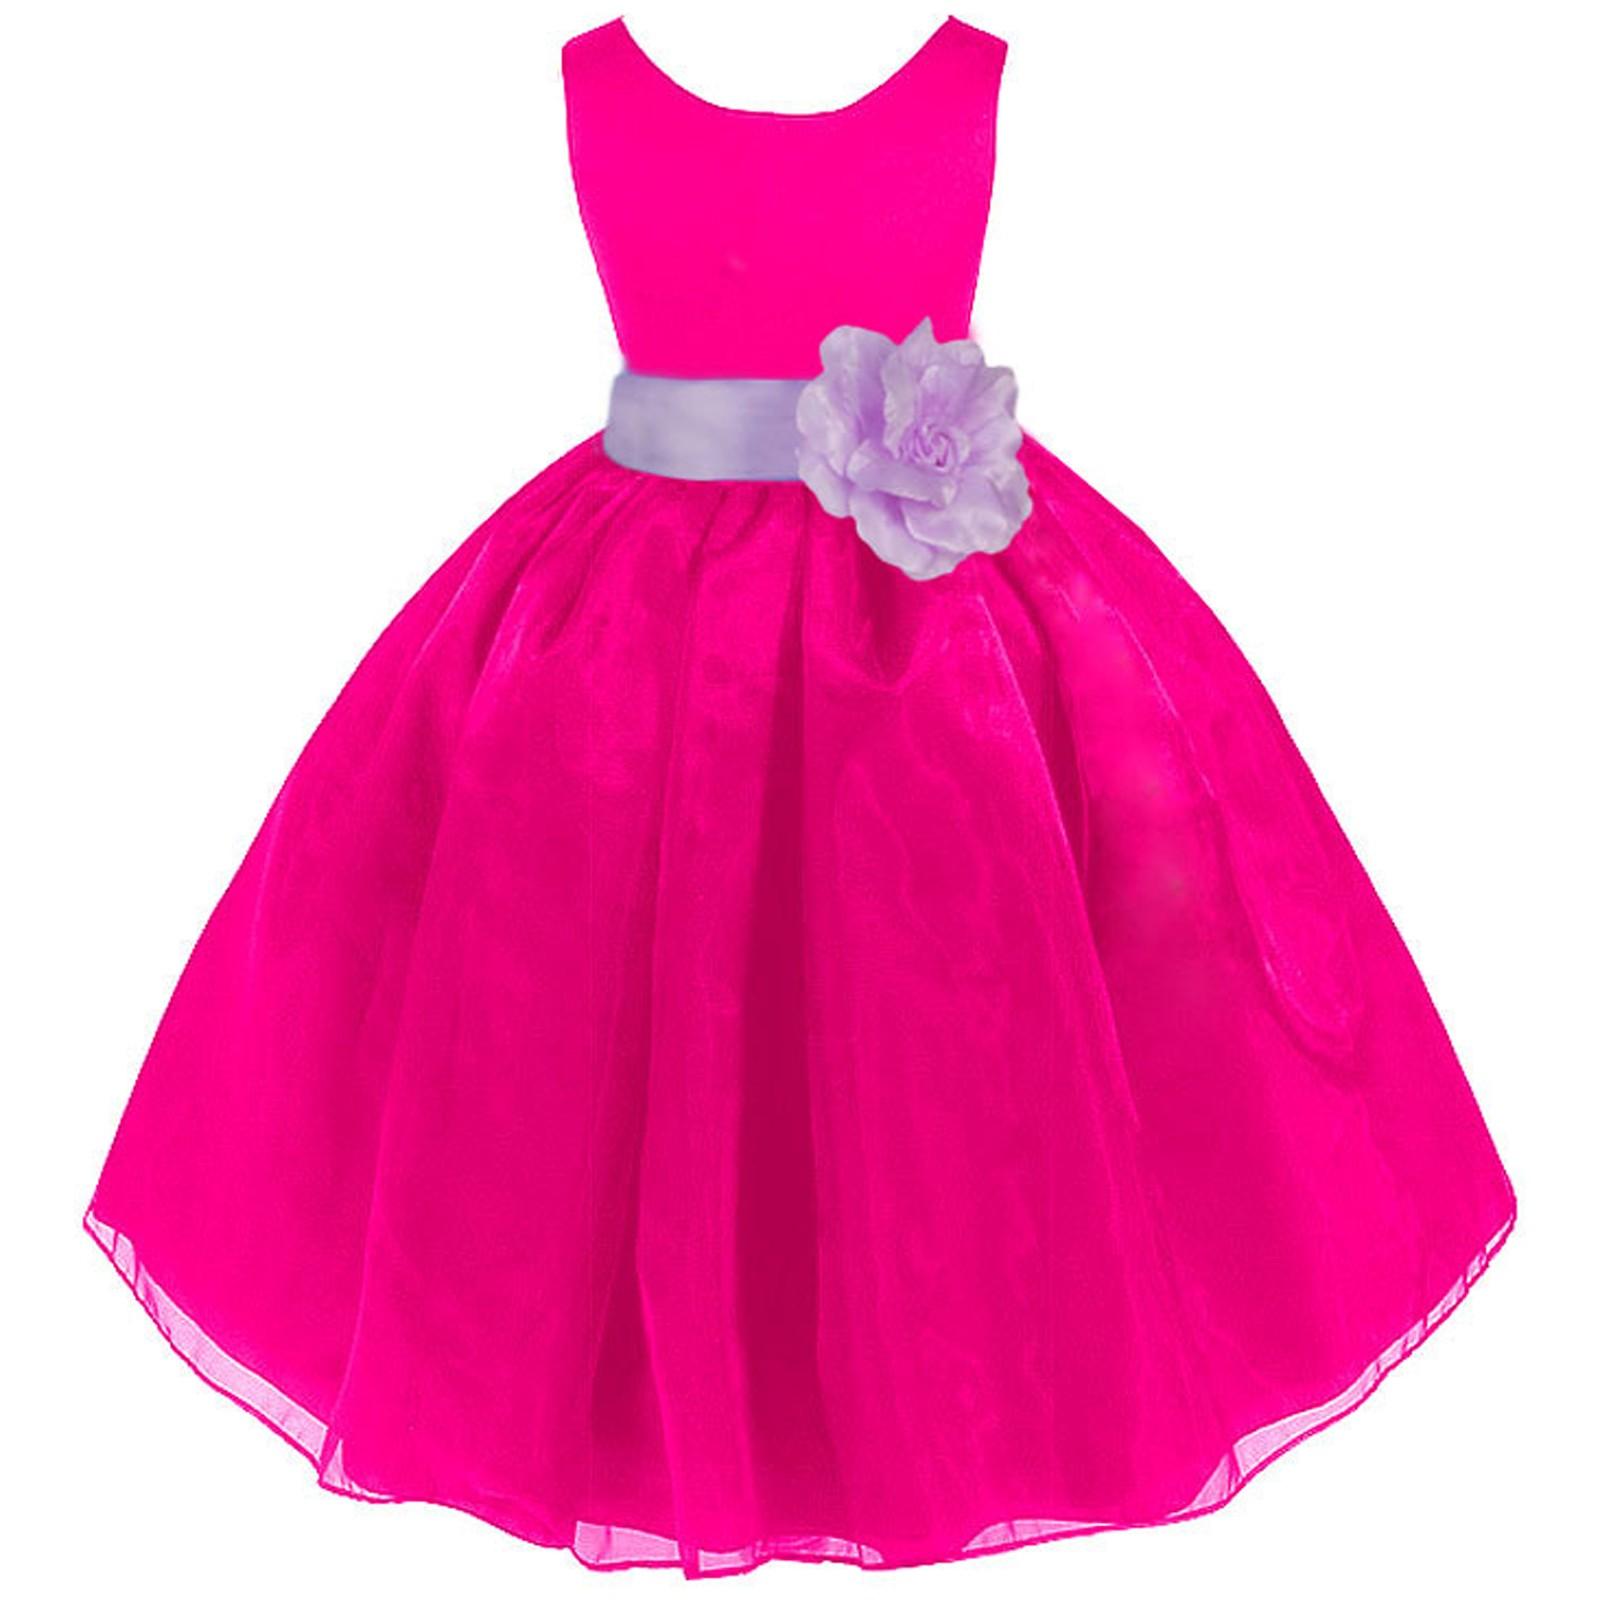 Fuchsialilac Satin Bodice Organza Skirt Flower Girl Dress 841t